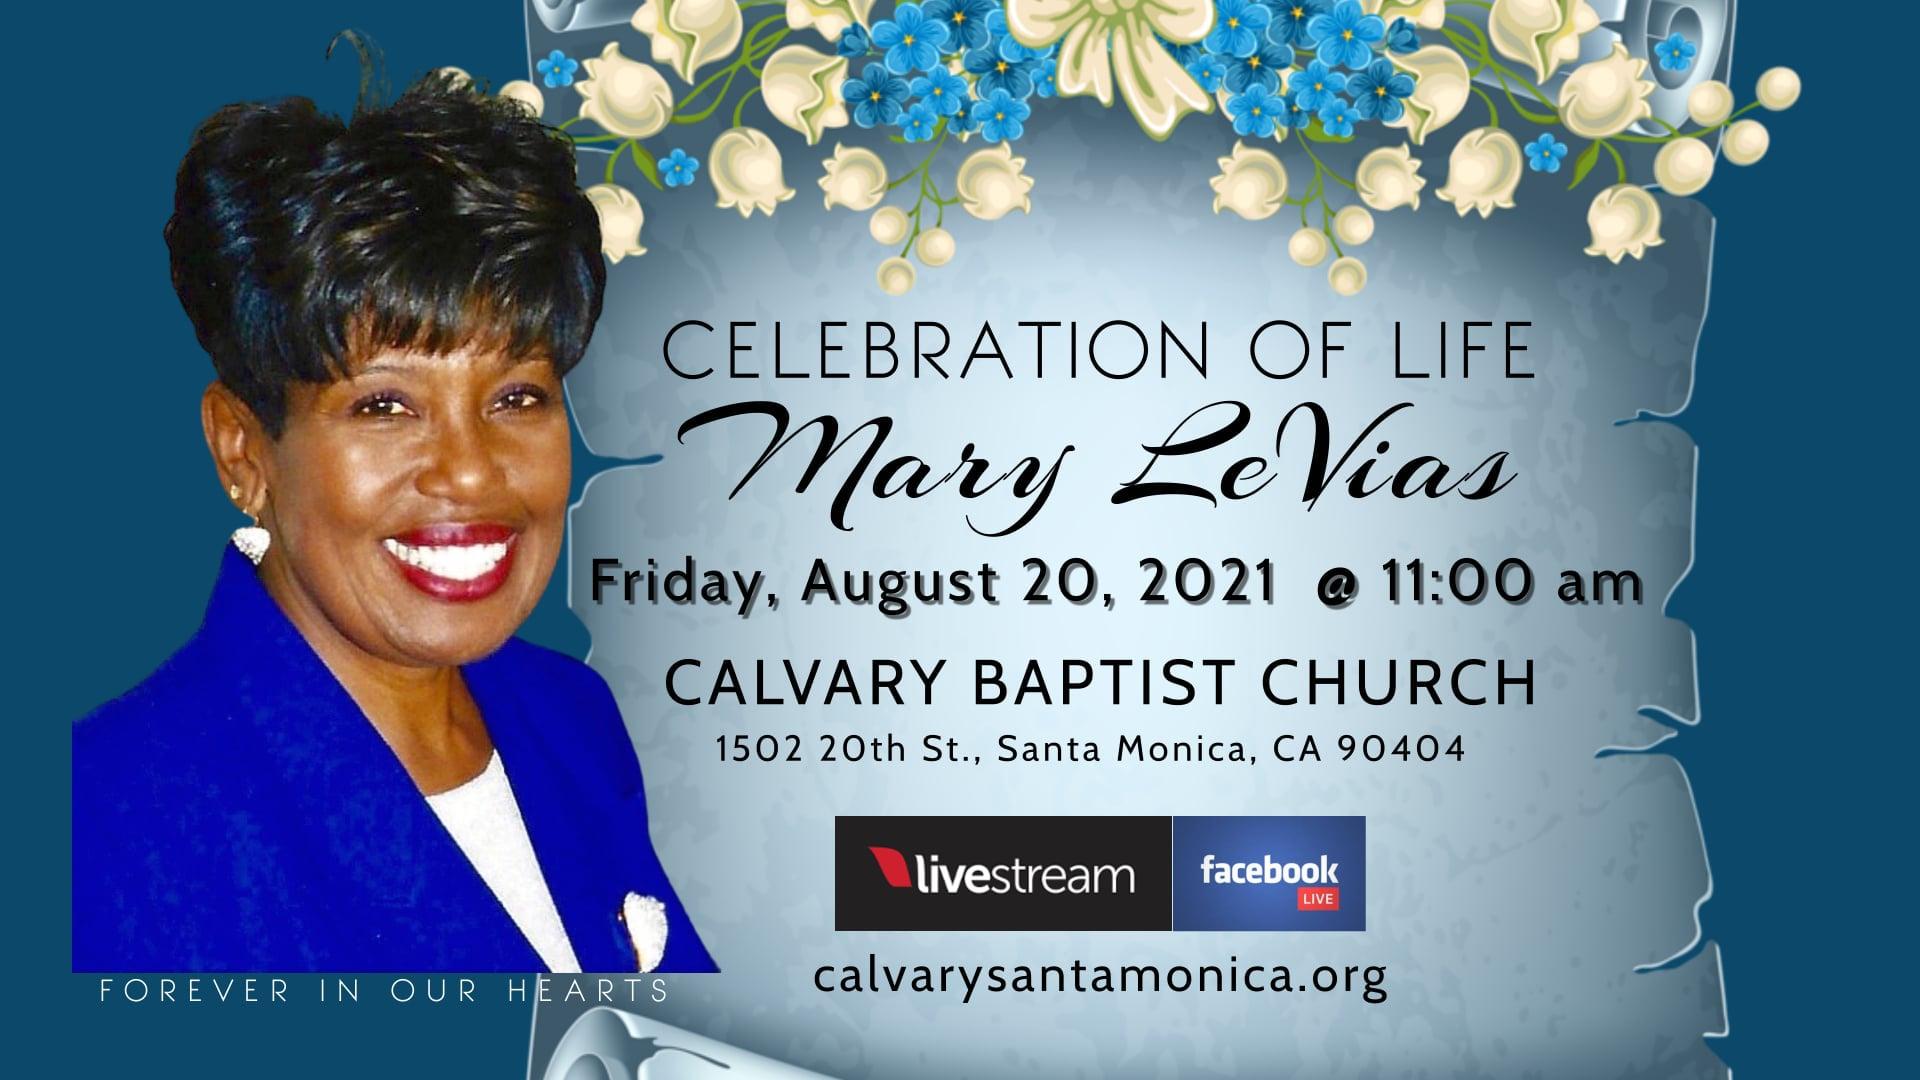 Celebration of Life - Mary LeVias 08.20.21